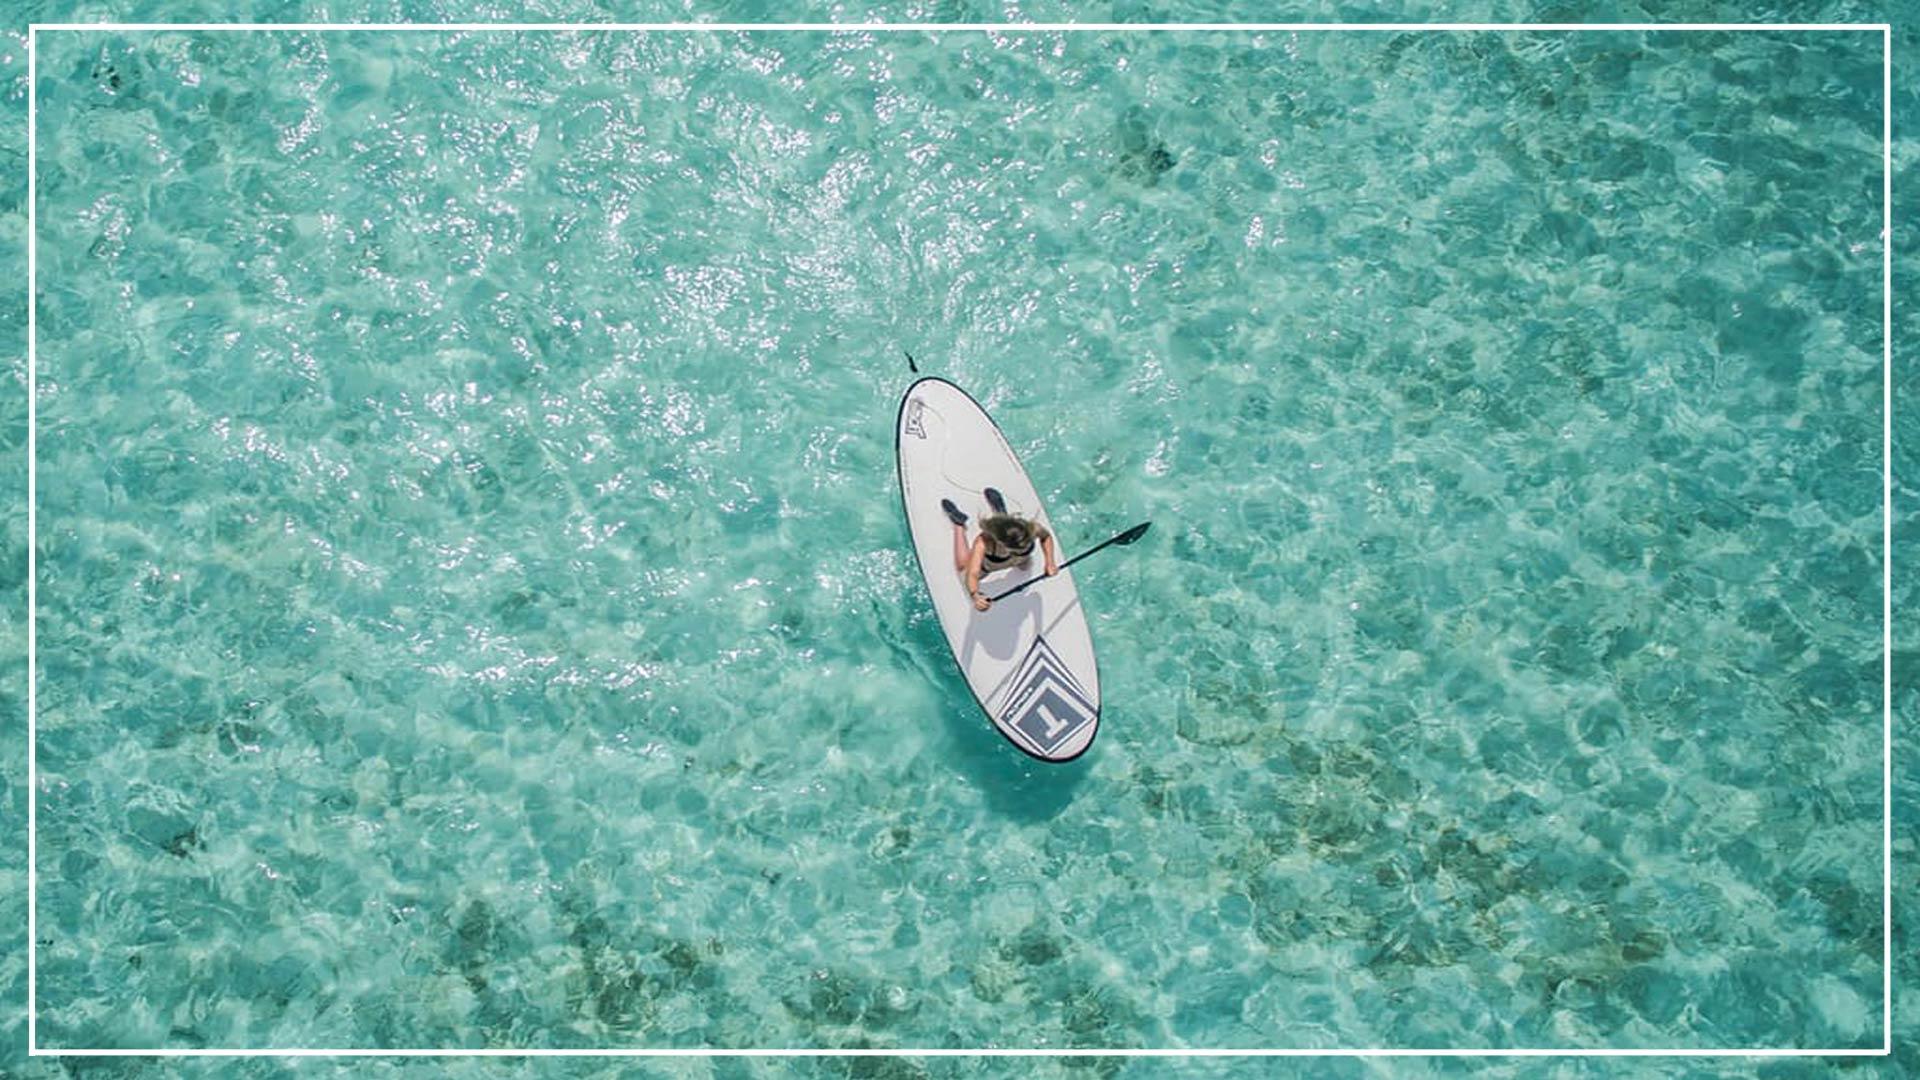 standup-paddle-giliislands-lesvillasottalia.jpg